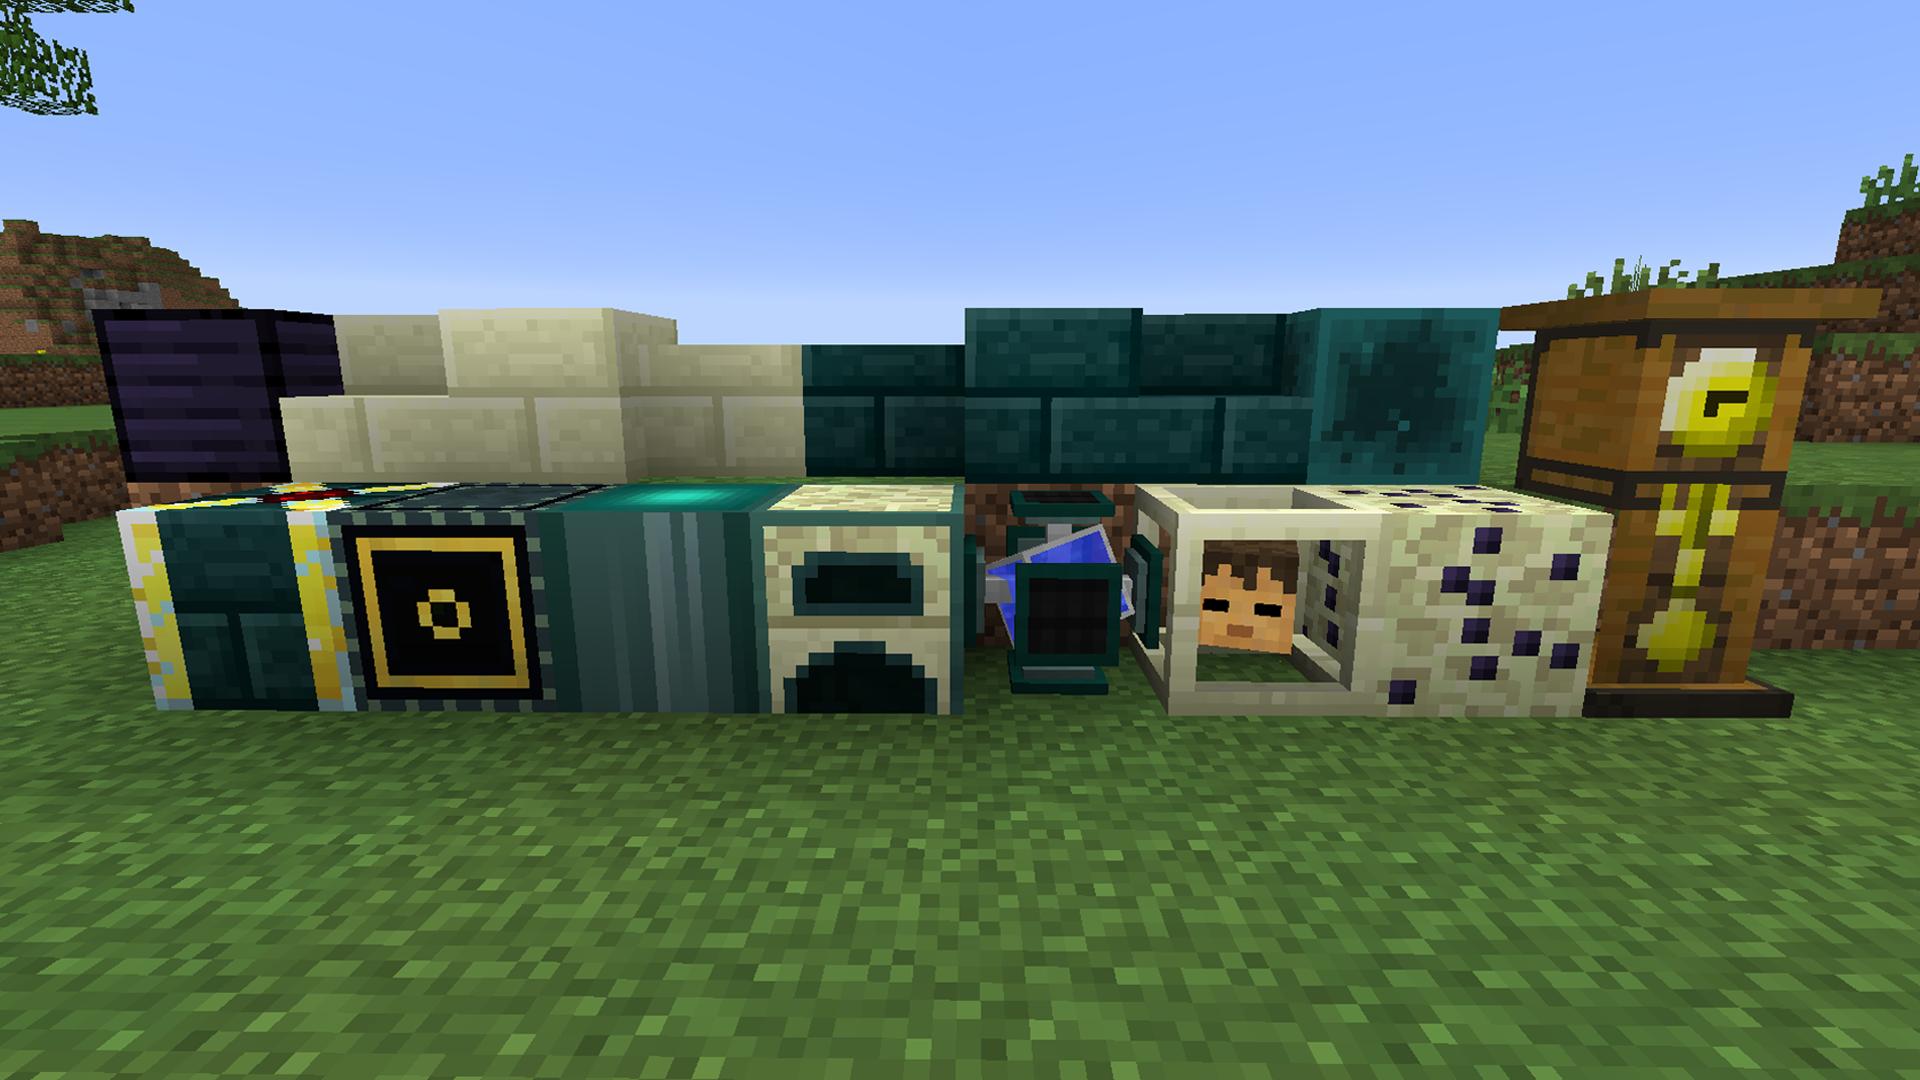 mod minecraft 1.8.3